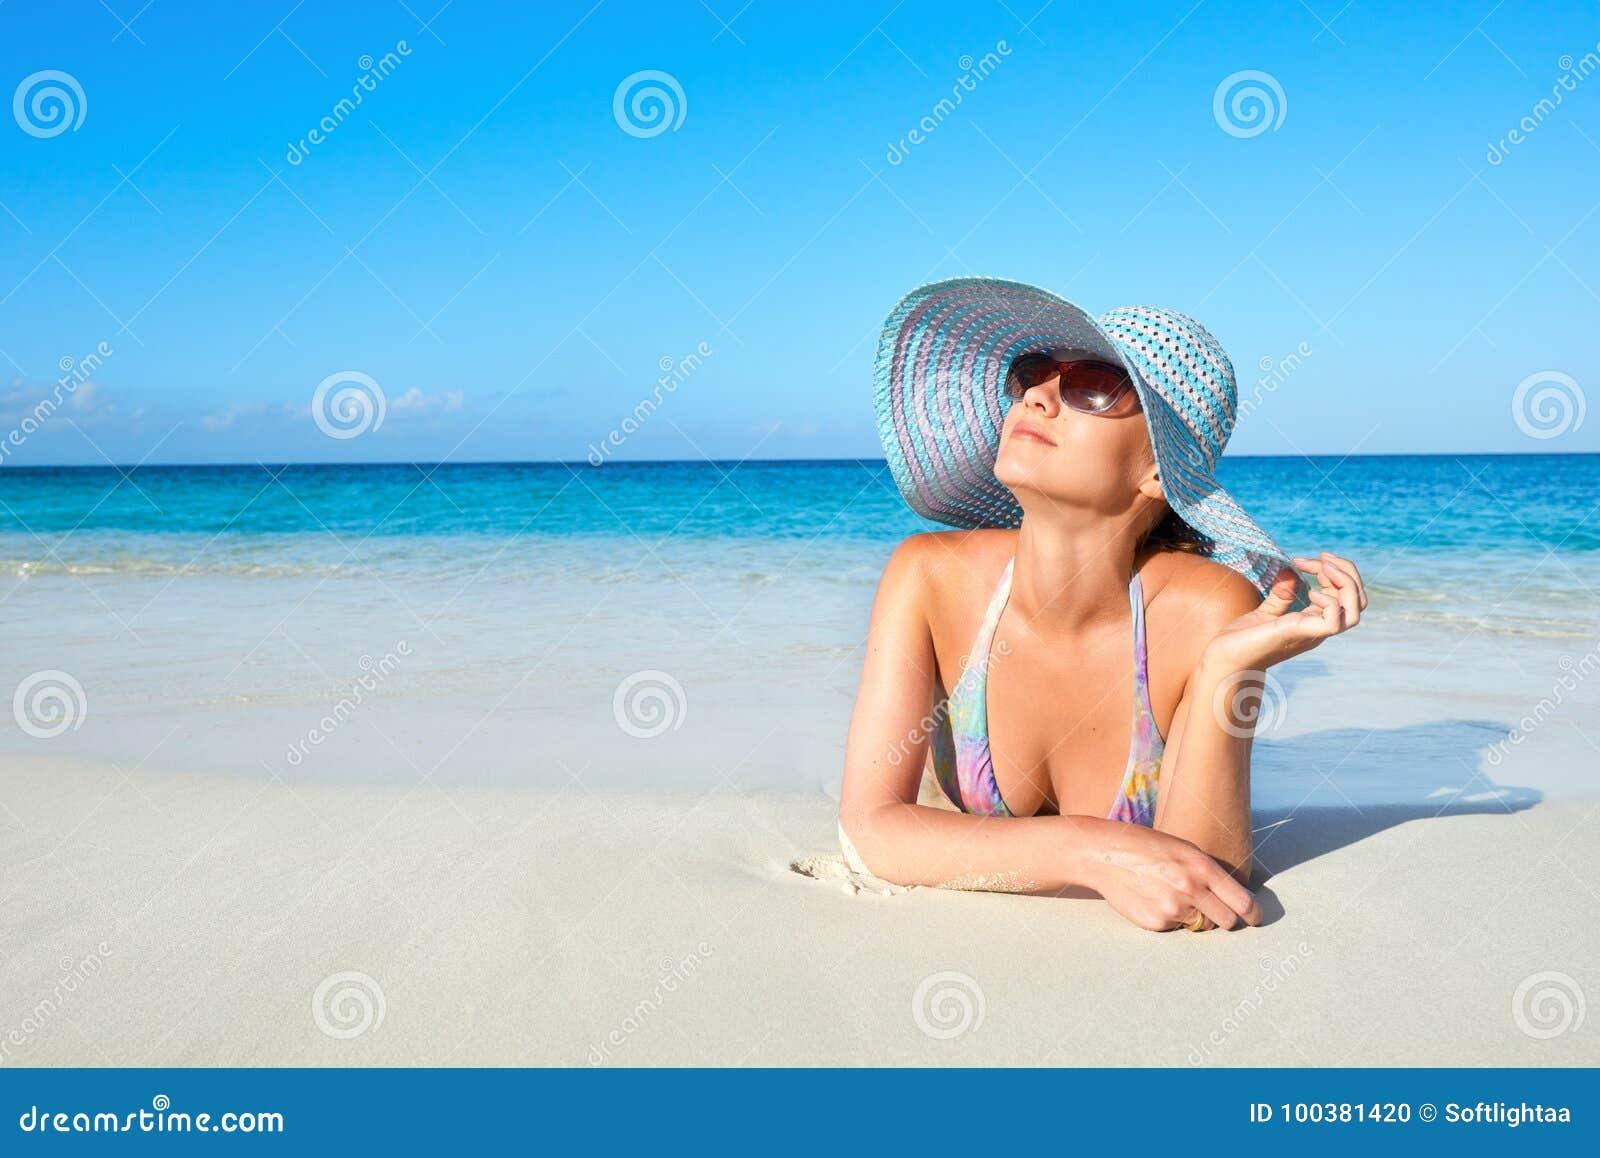 Woman in bikini and summer hat enjoying on tropical beach